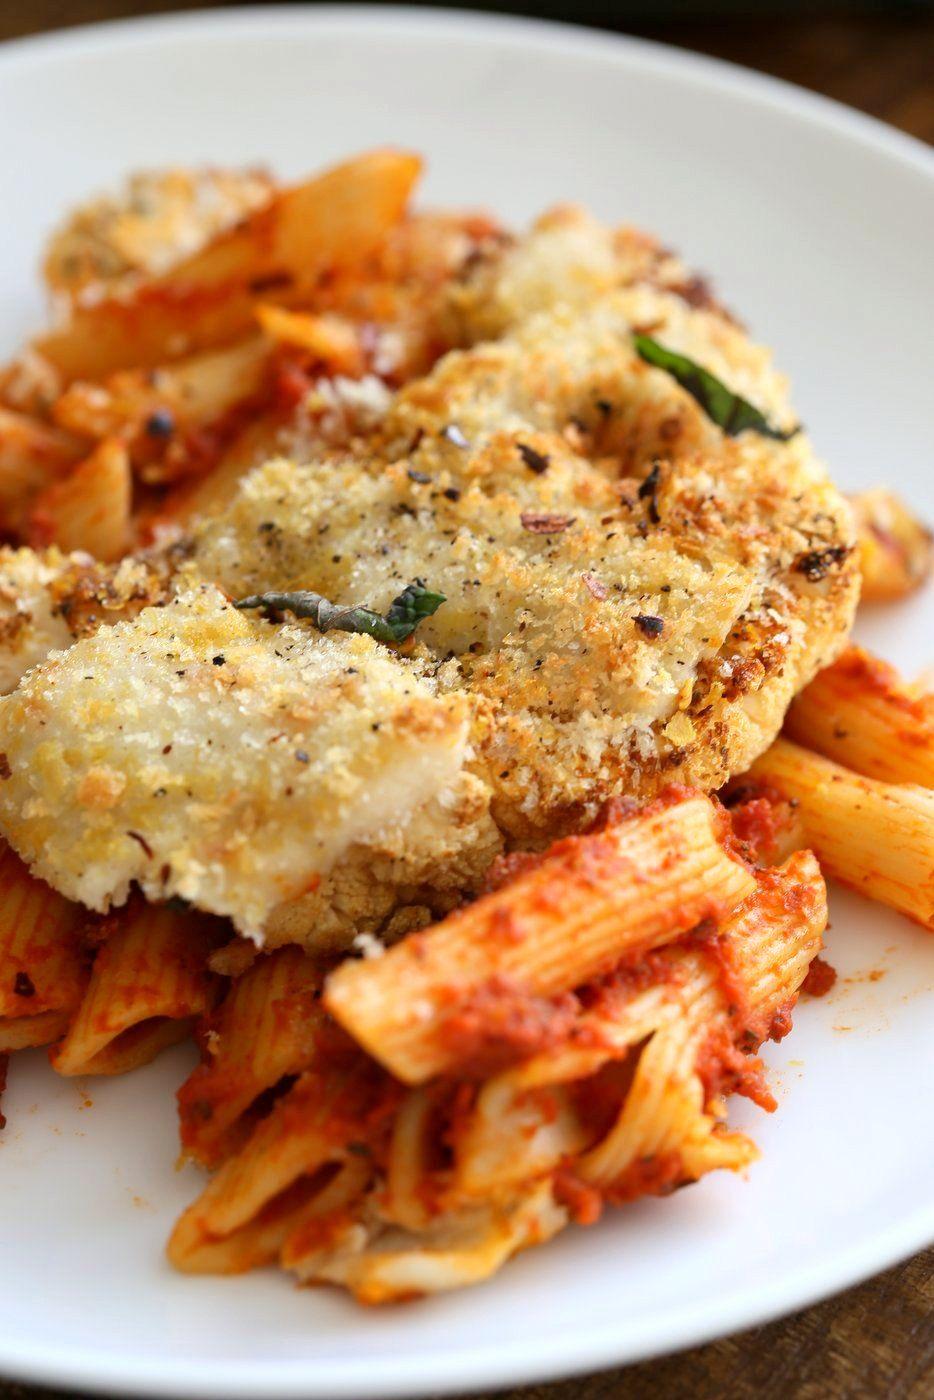 Vegan Cauliflower Parmesan Pasta Bake Vegan Richa Recipe Vegan Cauliflower Soy Free Recipes Pasta Dishes